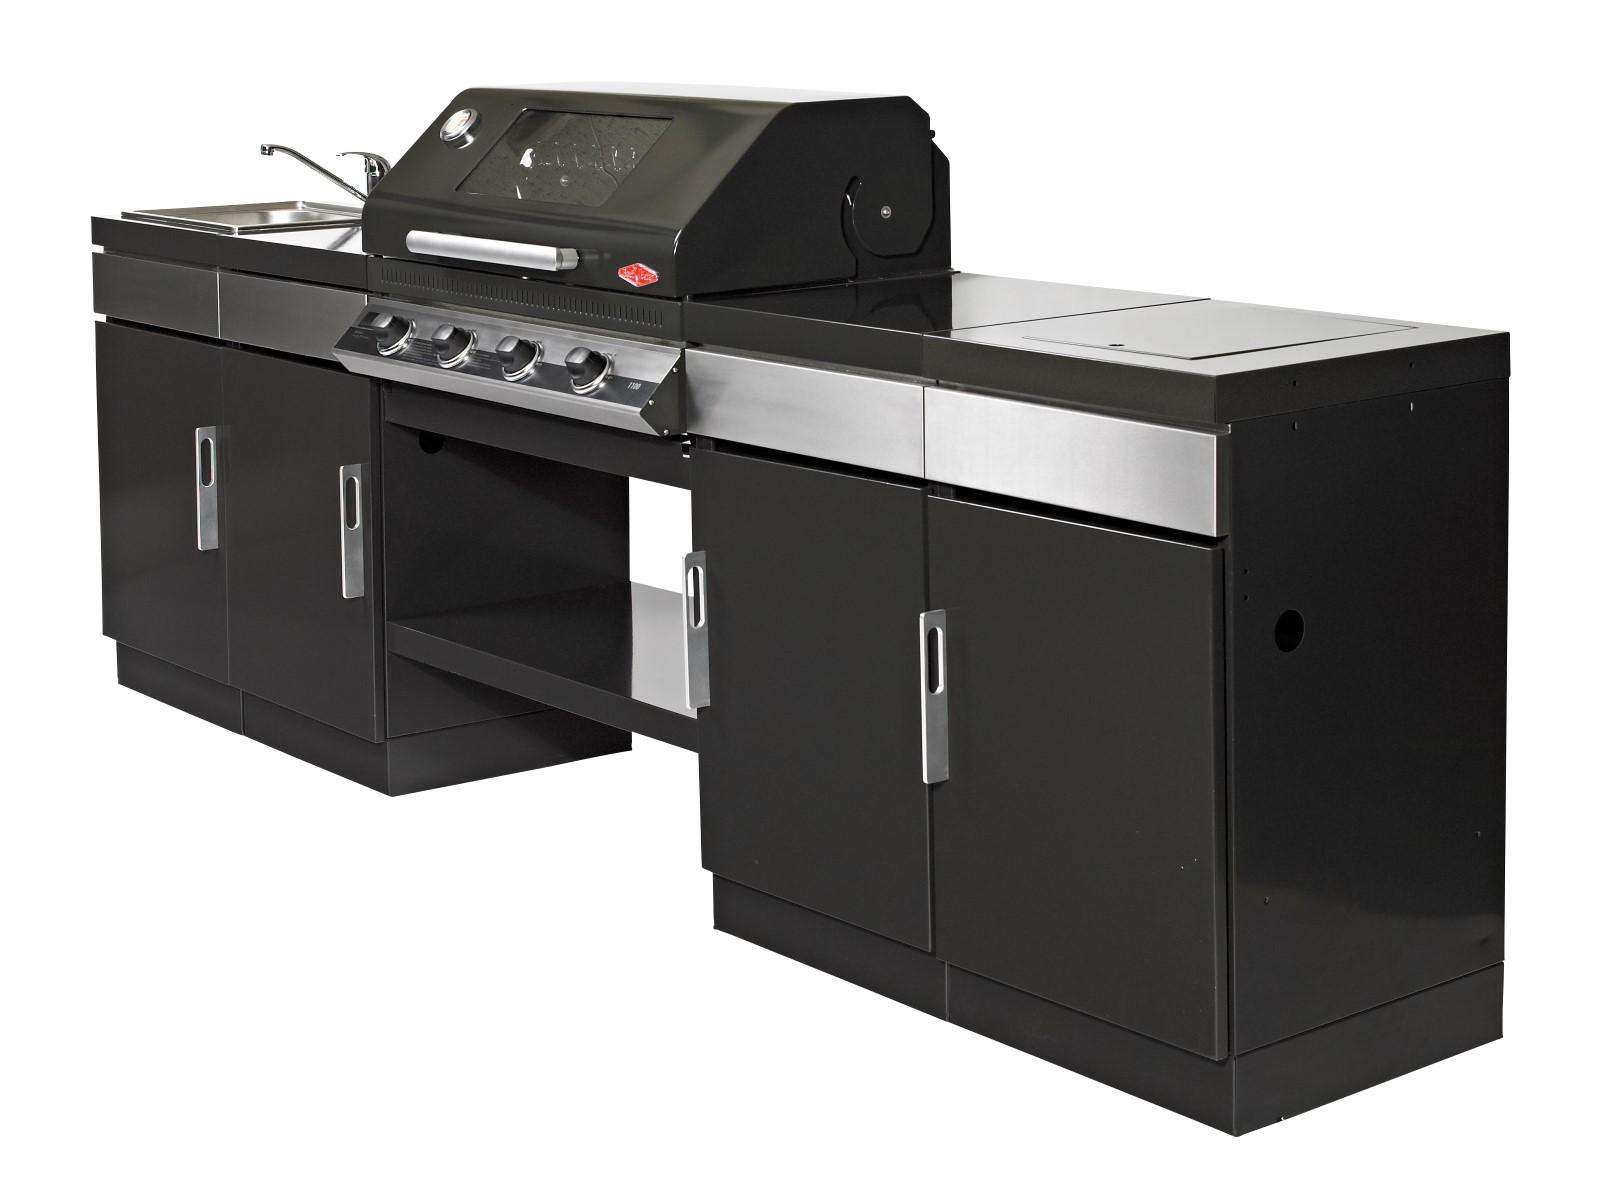 Outdoor Küche Module : Discovery 1100e 4 brenner emaille outdoor kÜche 4er modul bevemo